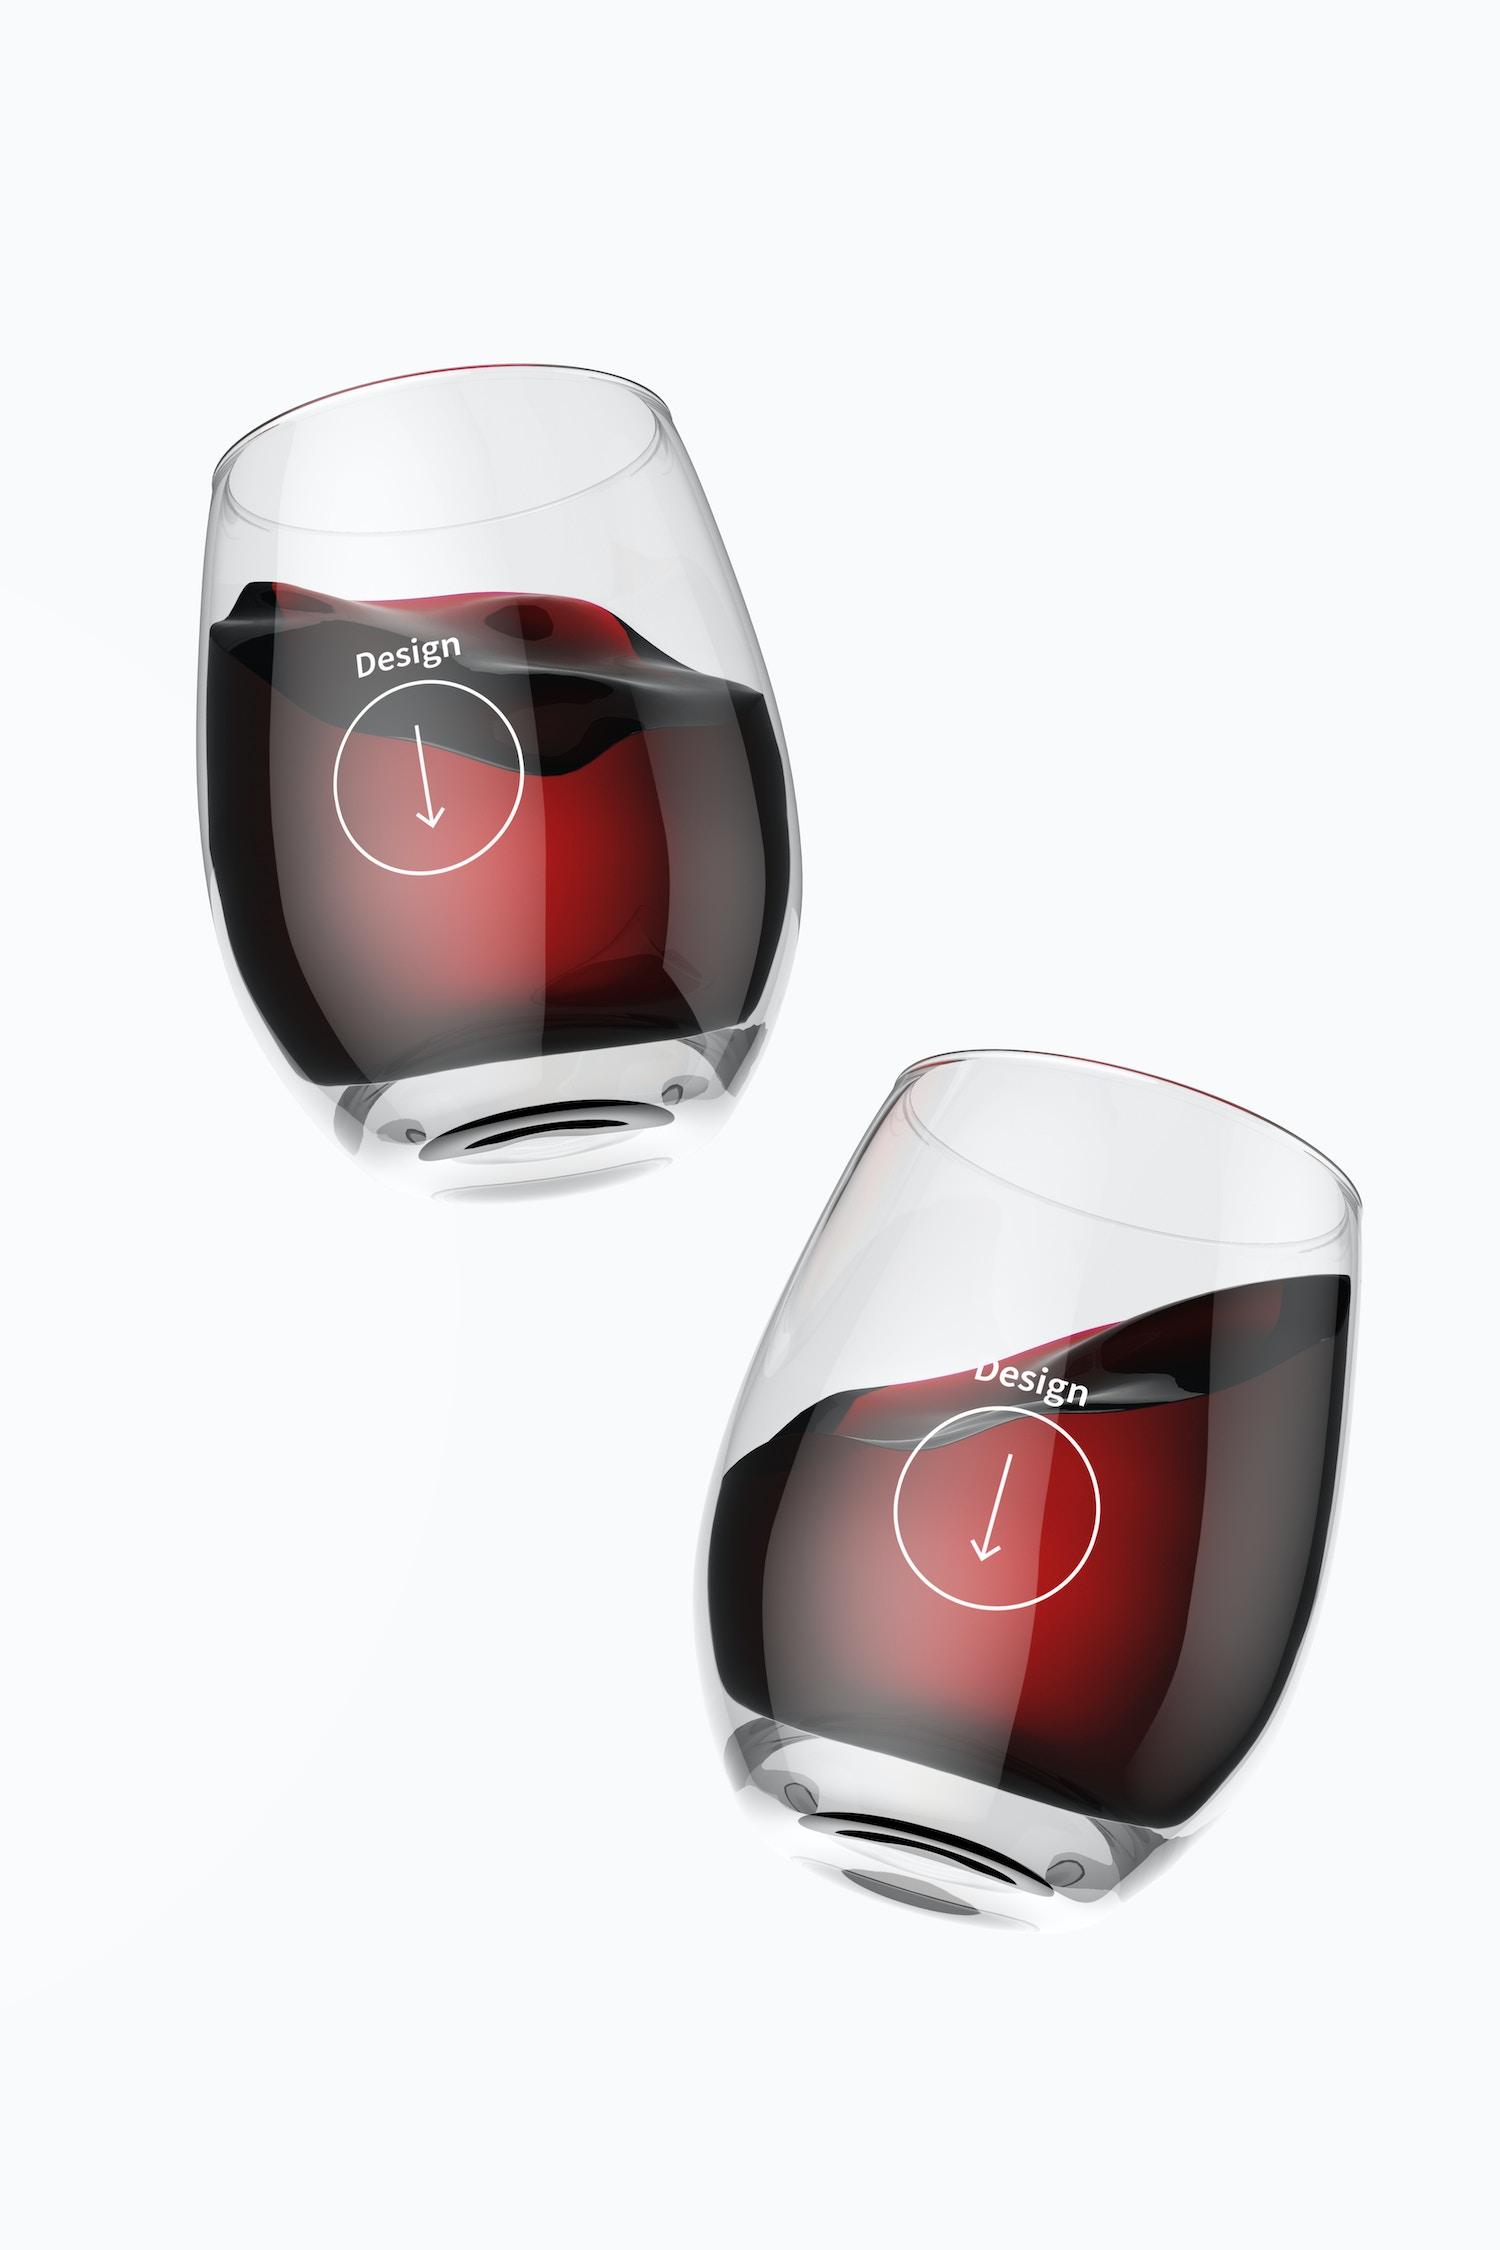 15 oz Glass Wine Cups Mockup, Floating